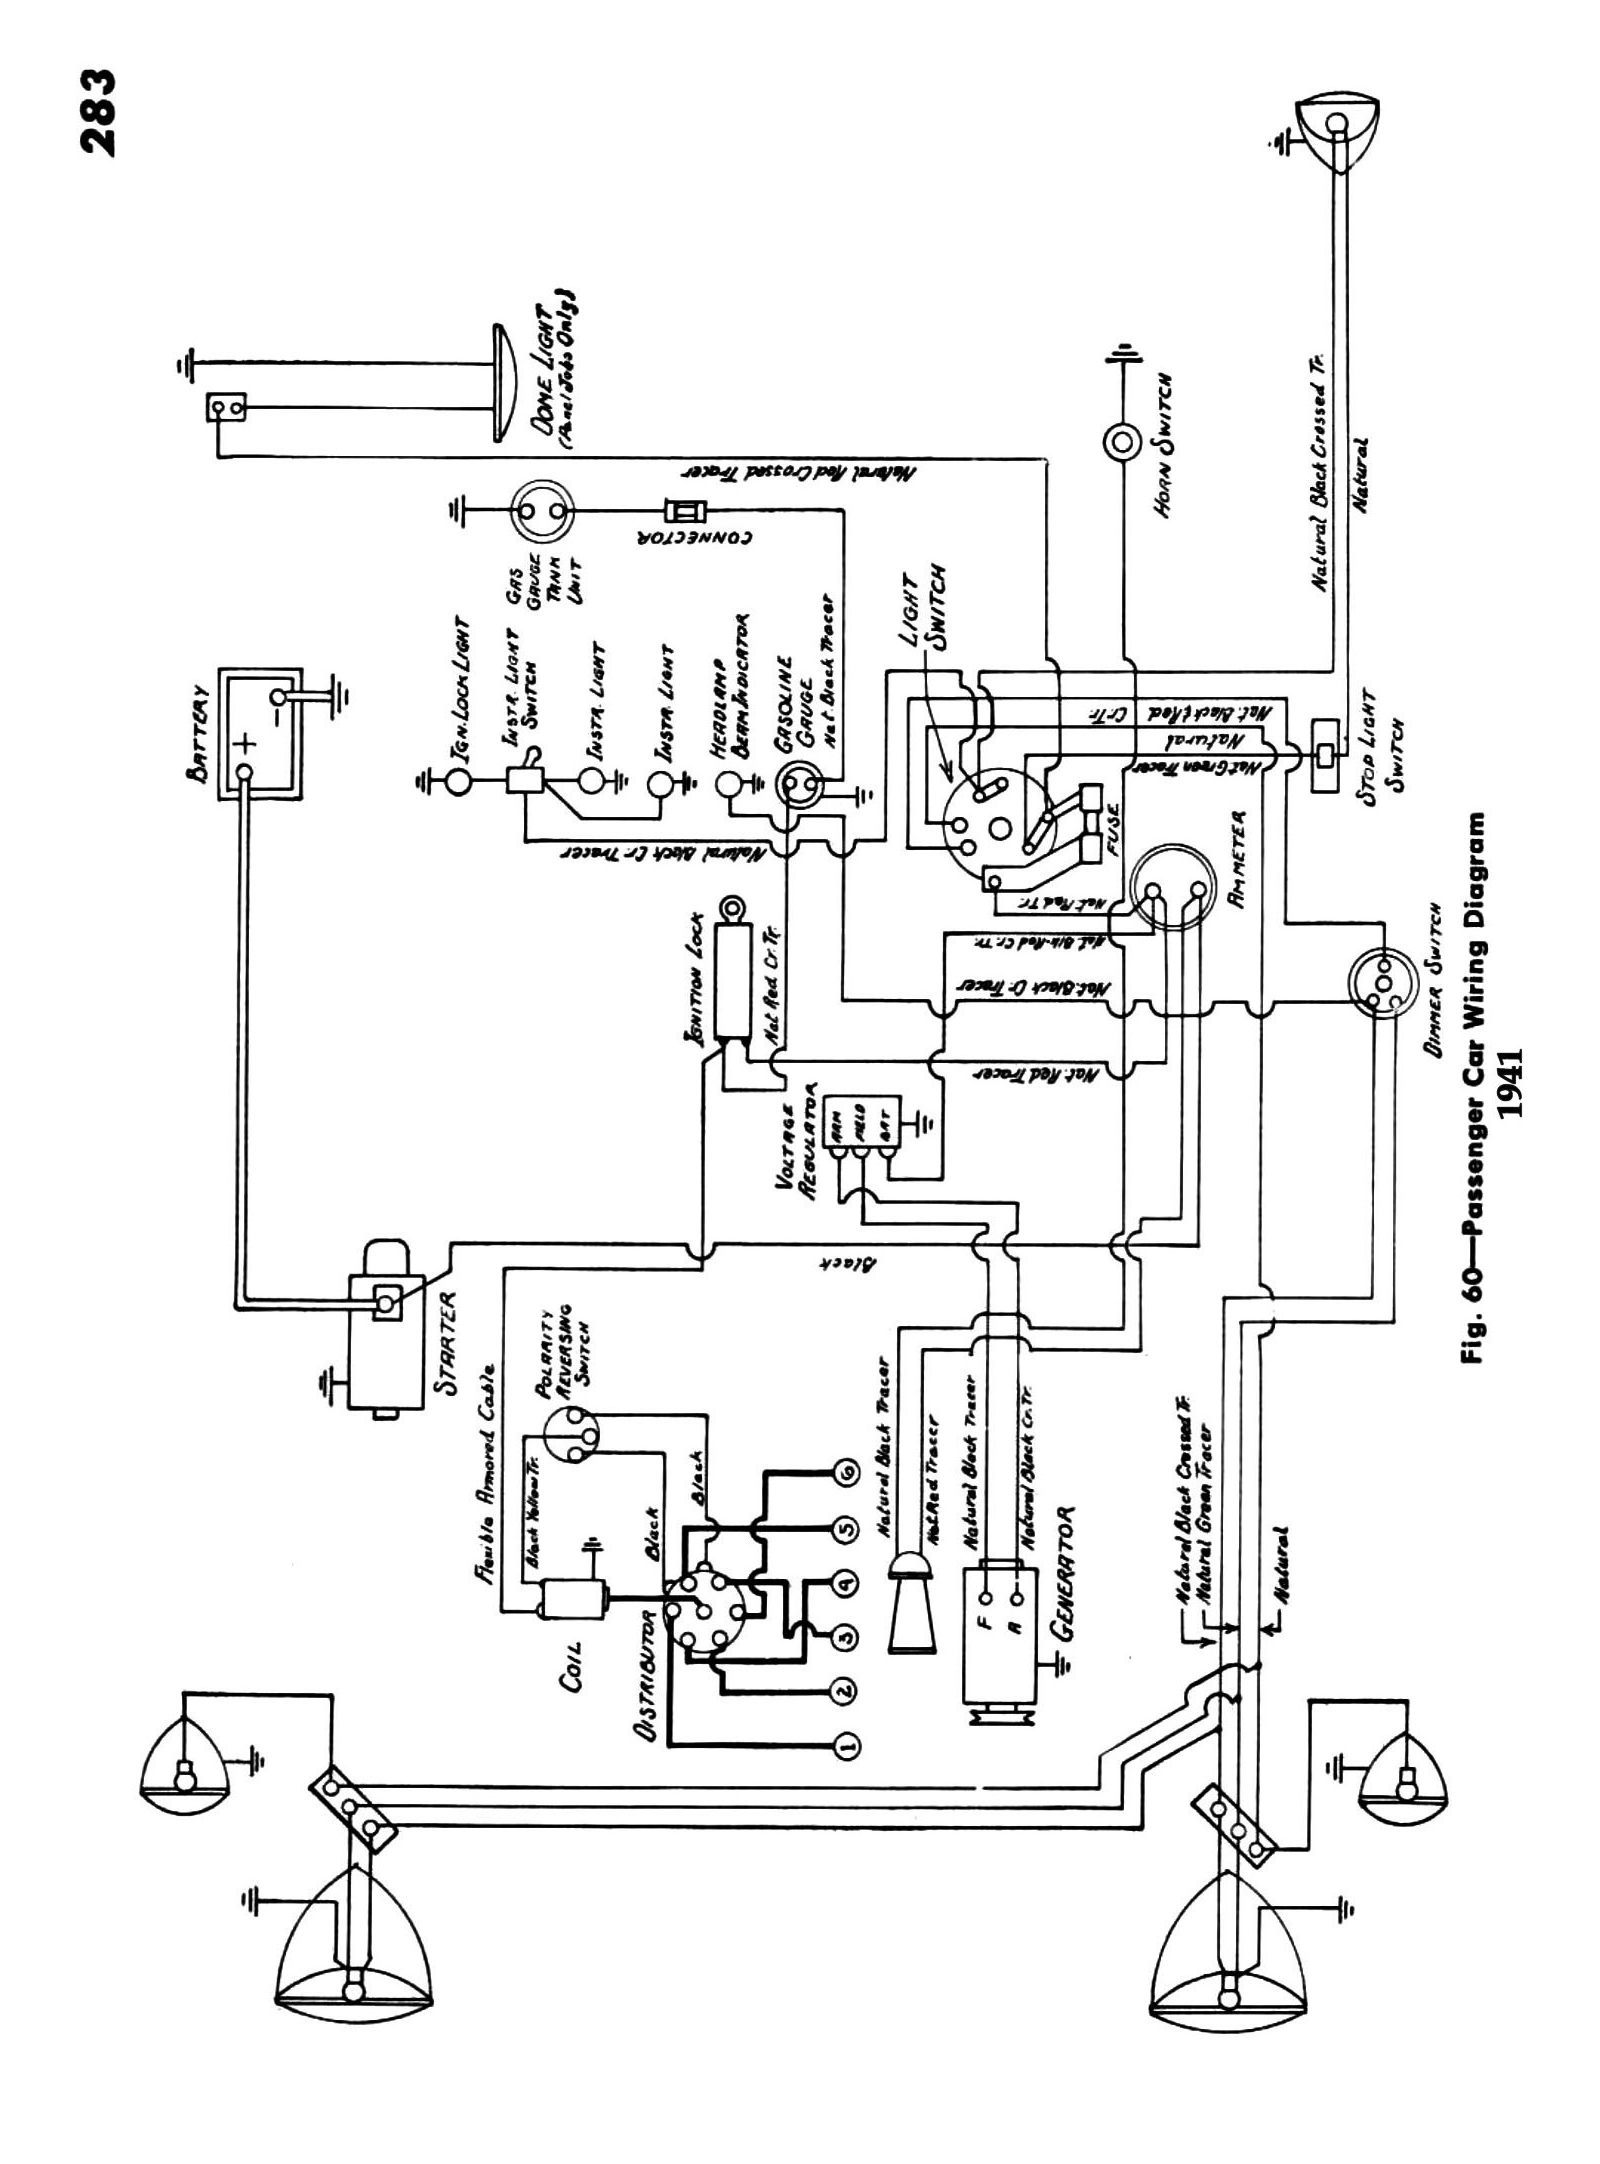 1938 Buick Wiring Diagram Schematic 2001 Mercedes S430 Fuse Box Diagram Piooner Radios 2020ok Jiwa Jeanjaures37 Fr